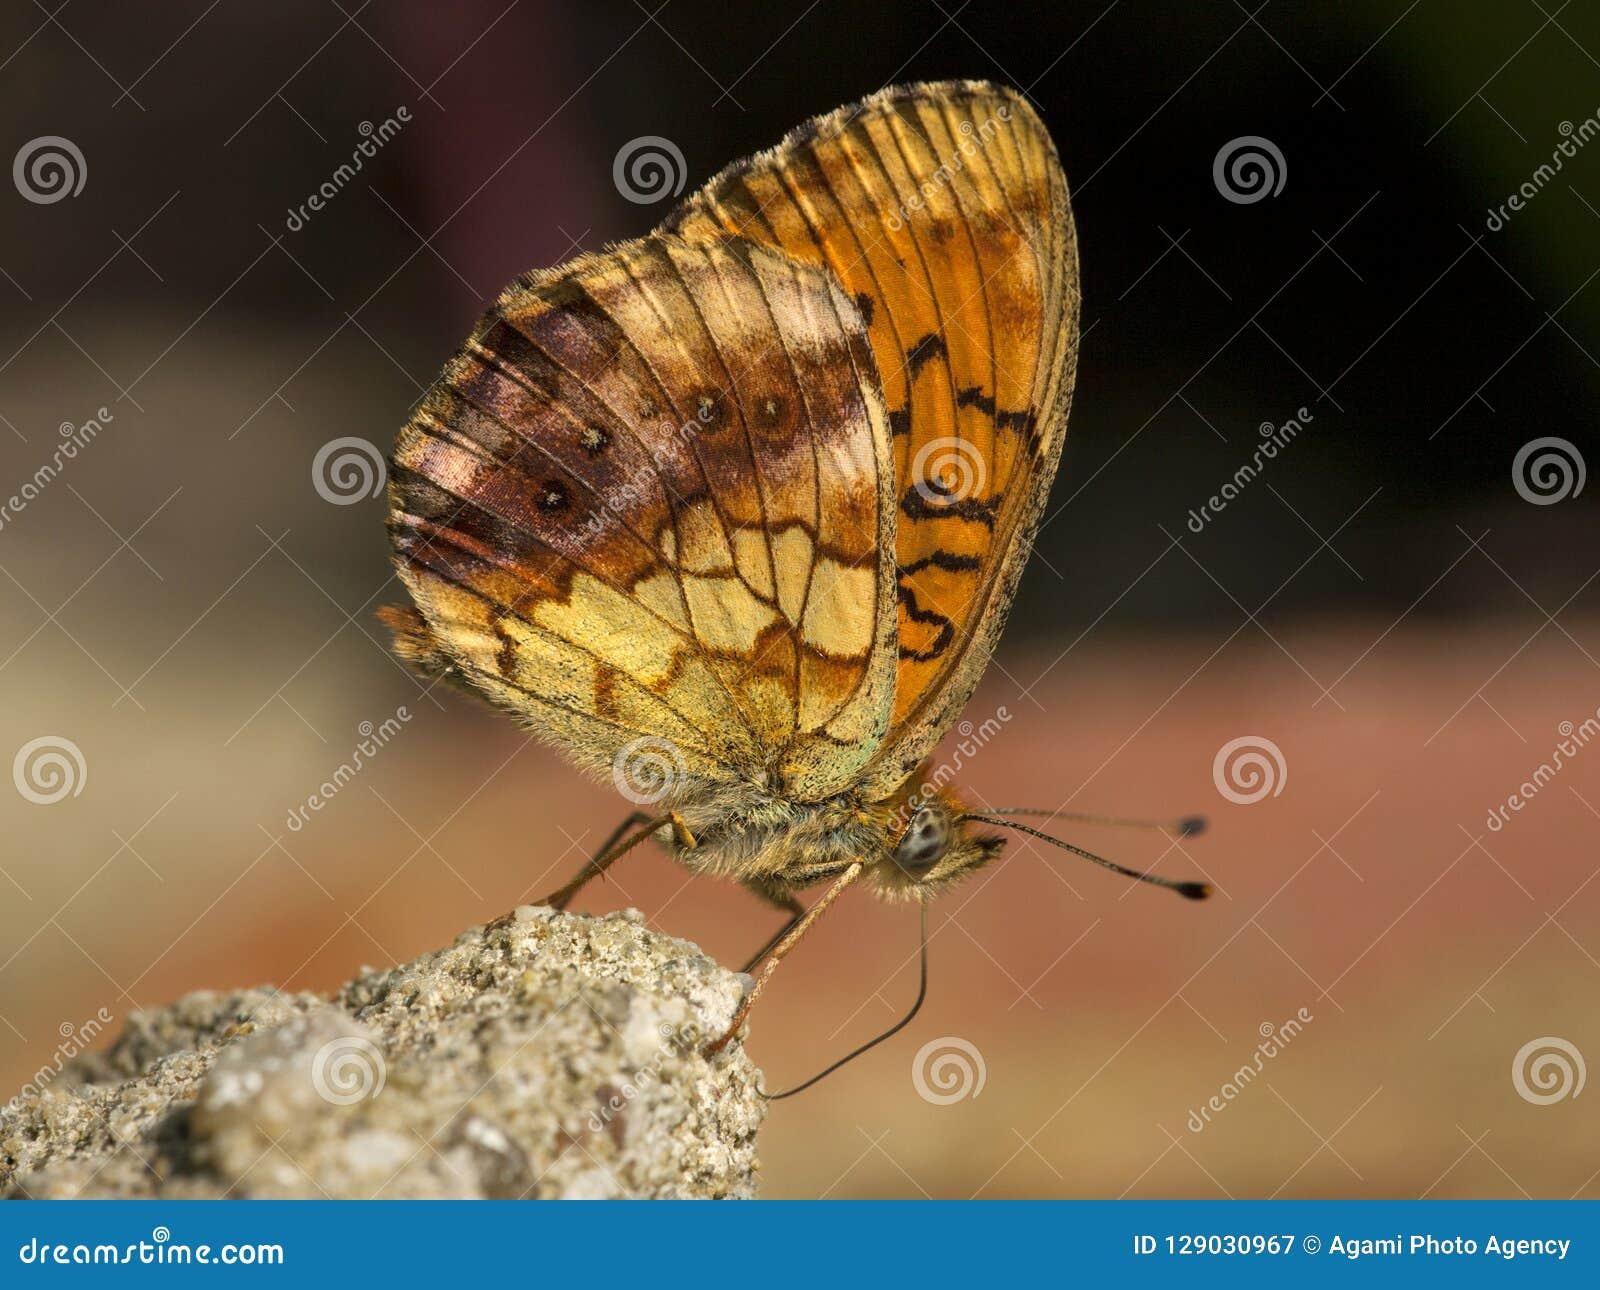 Braamparelmoervlinder, Marmerfritillary, Brenthis daphne